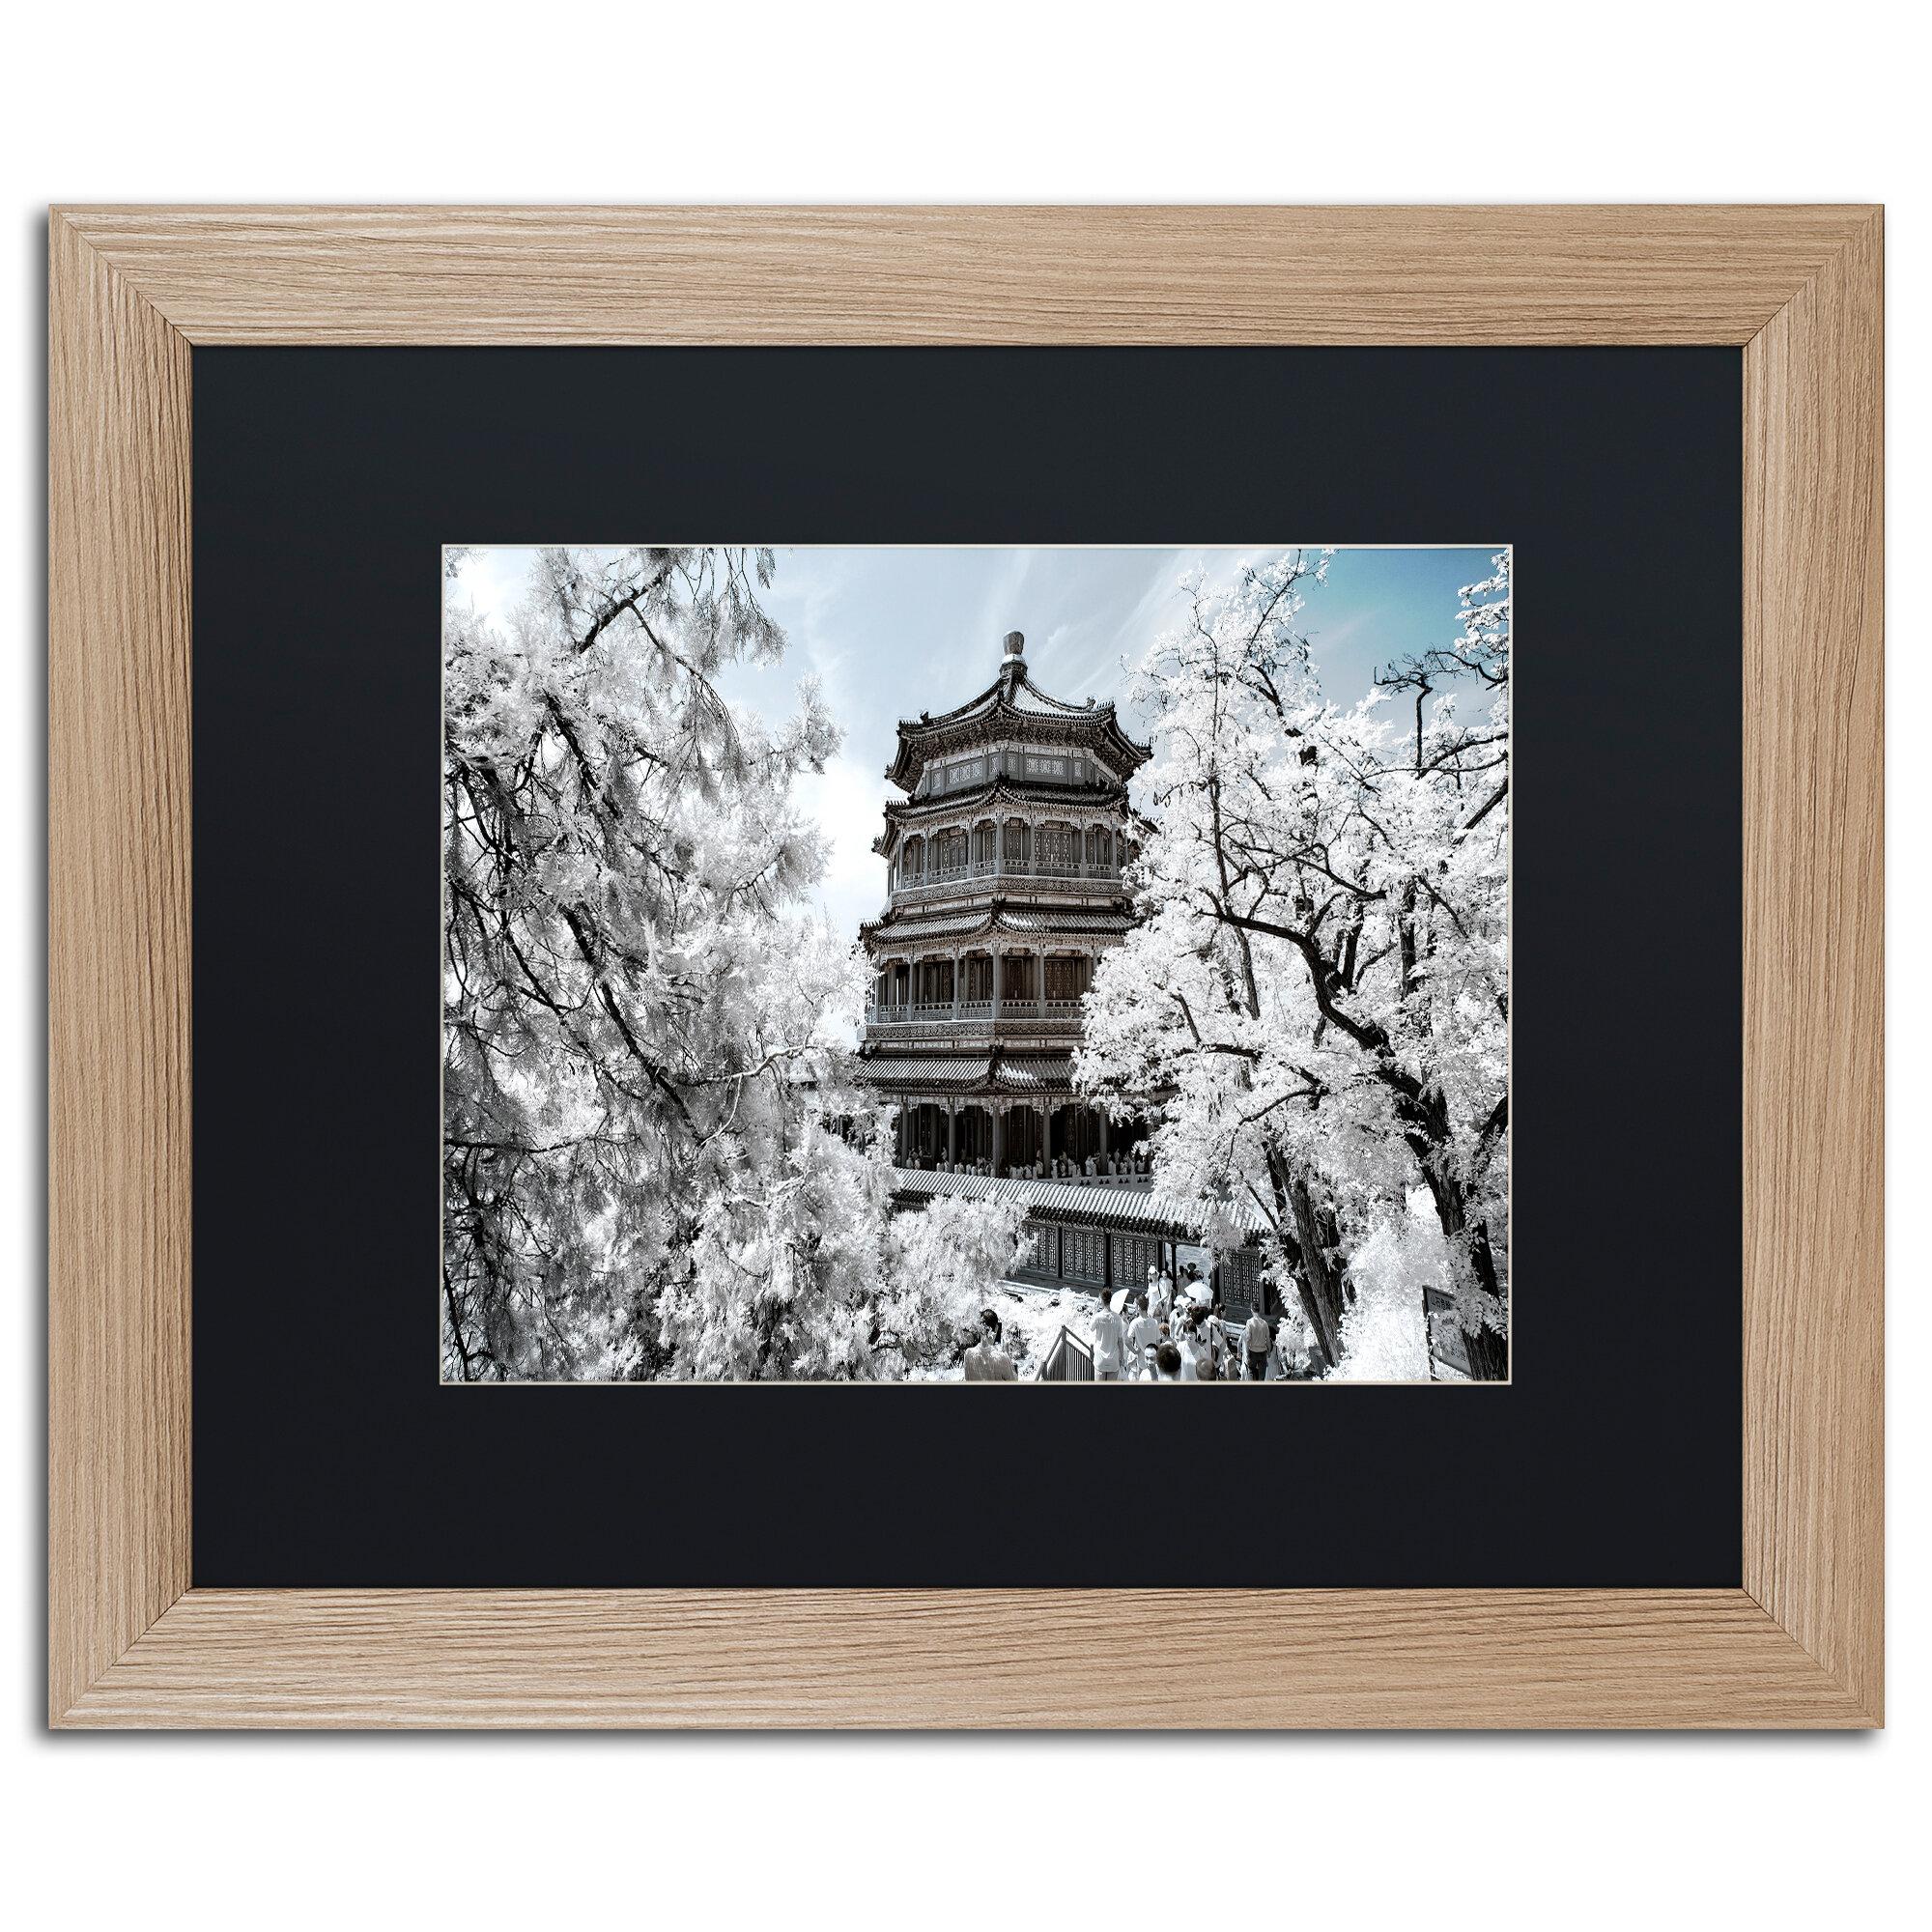 Trademark Art White Temple I By Philippe Hugonnard Framed Photographic Print Wayfair